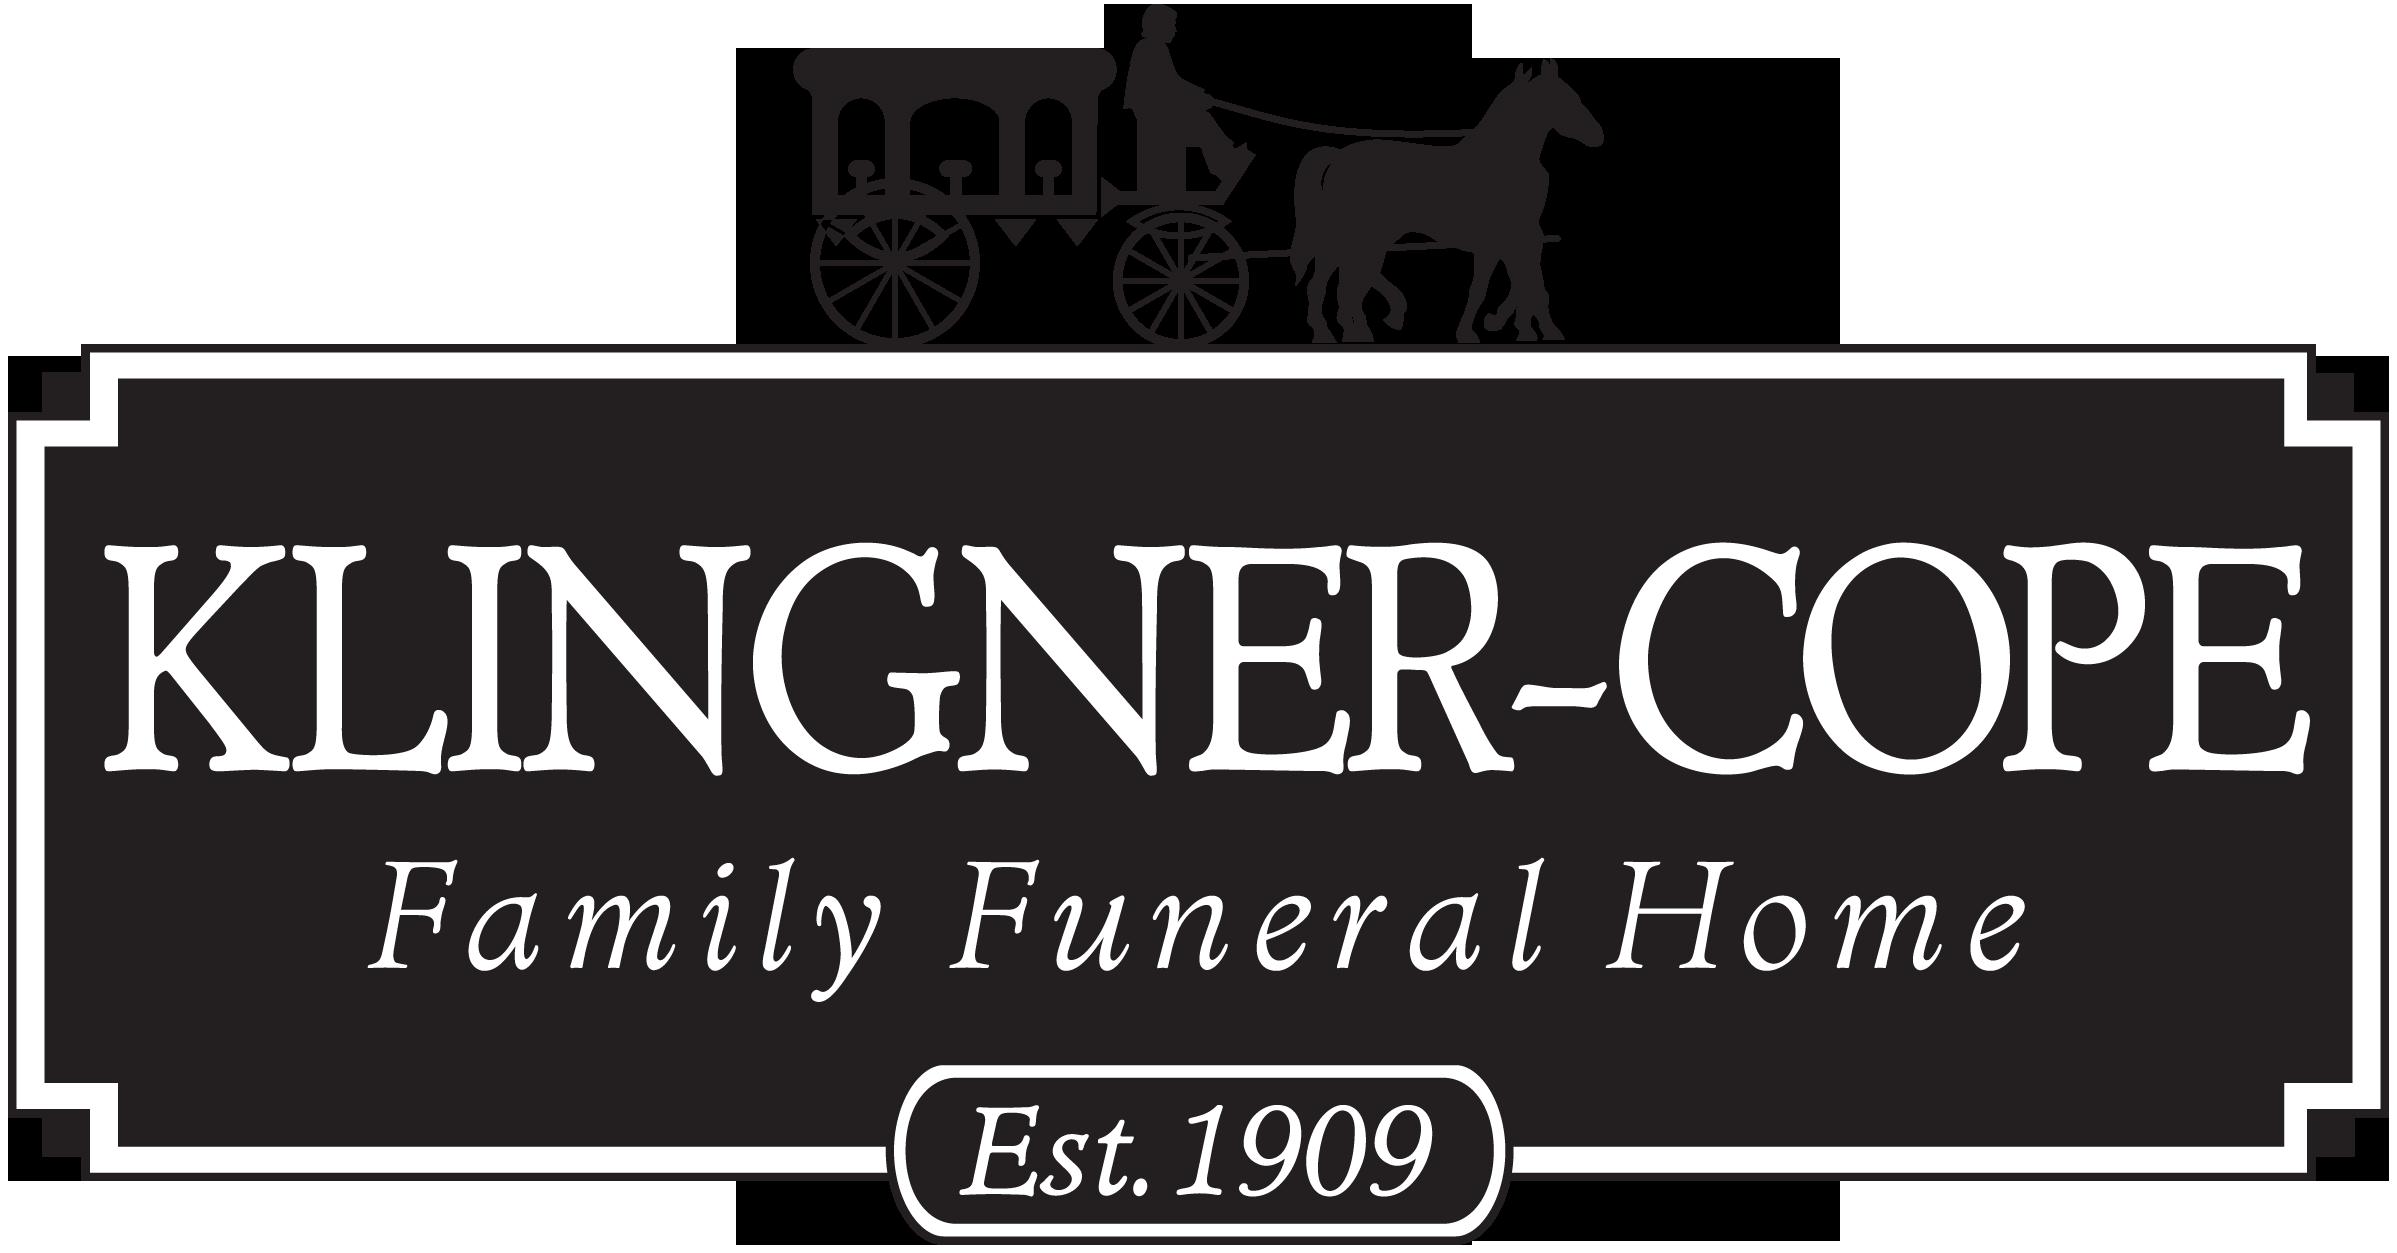 Klingner-Cope at Rivermonte